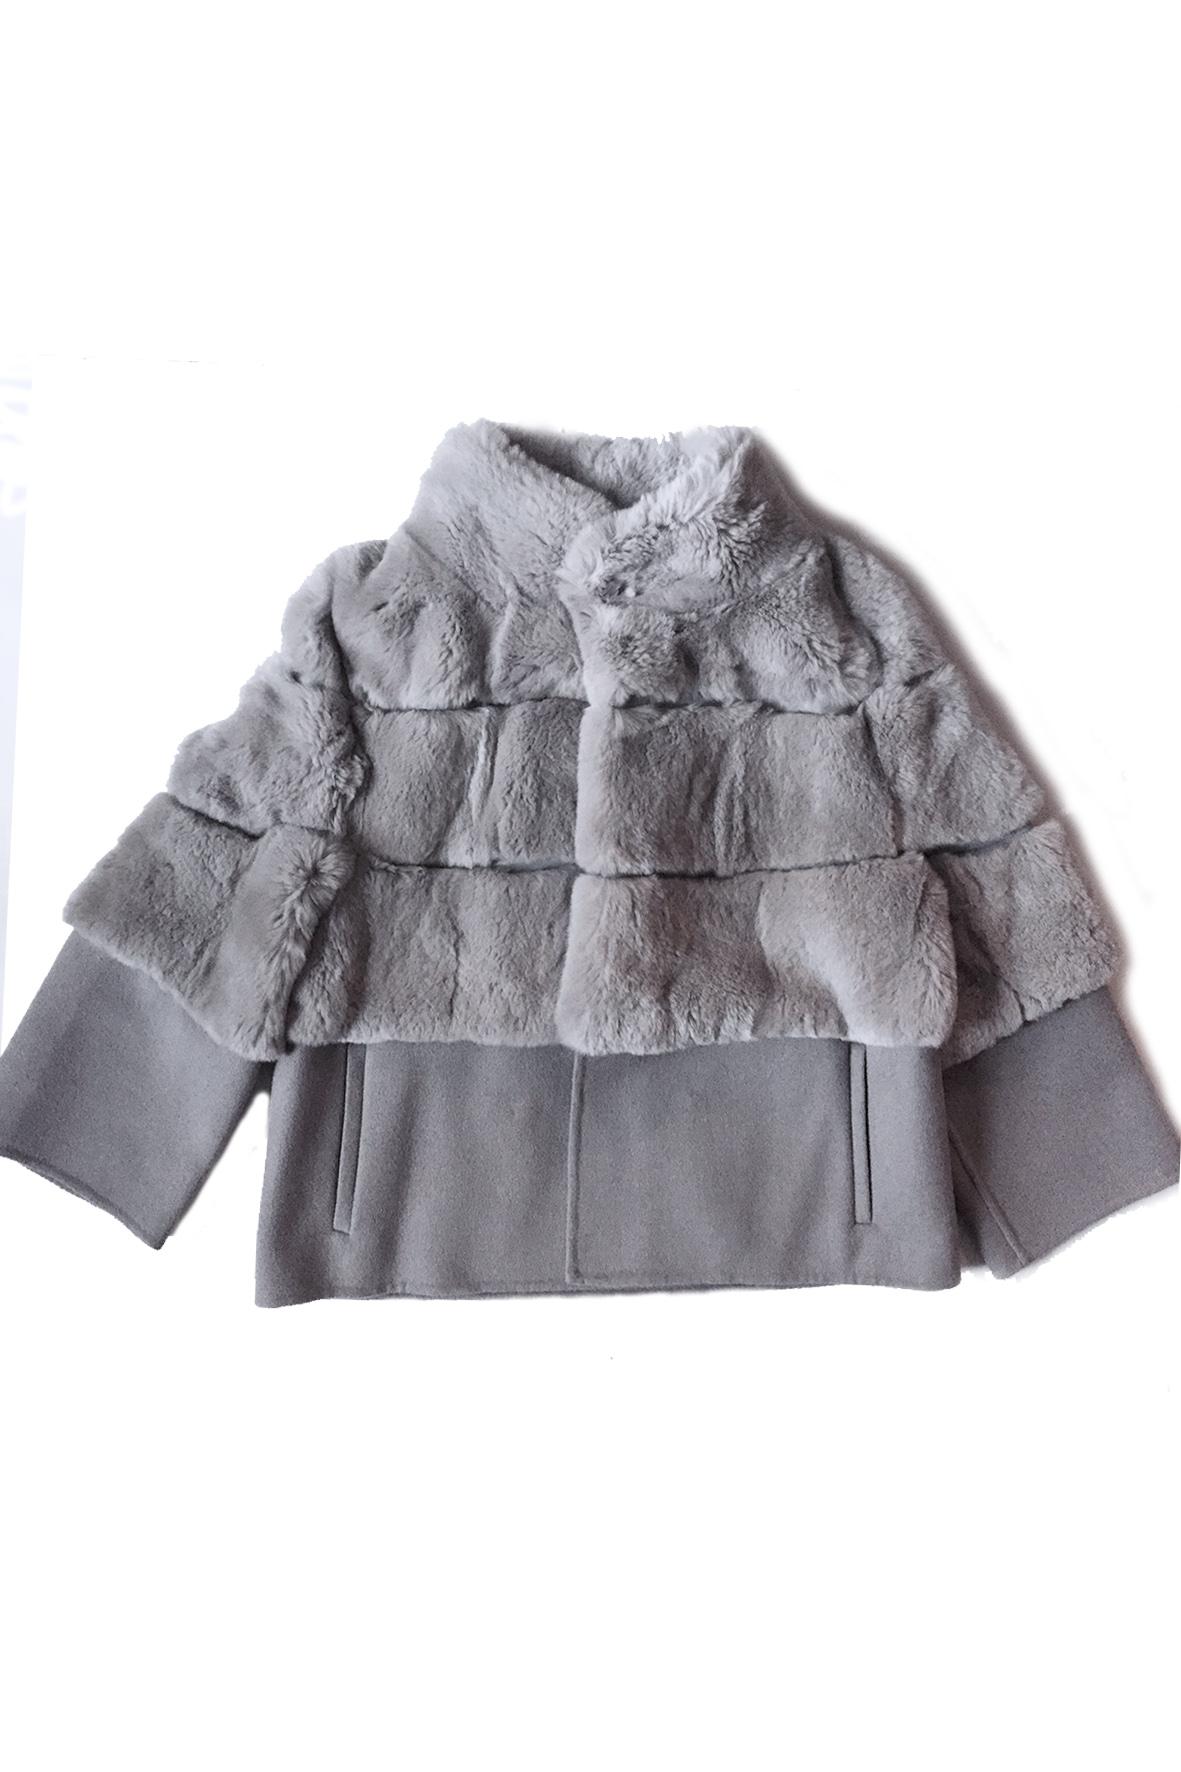 2018-2019fall-winter Rish NY Collections2018-2019秋冬 リッシュ・ニューヨーク